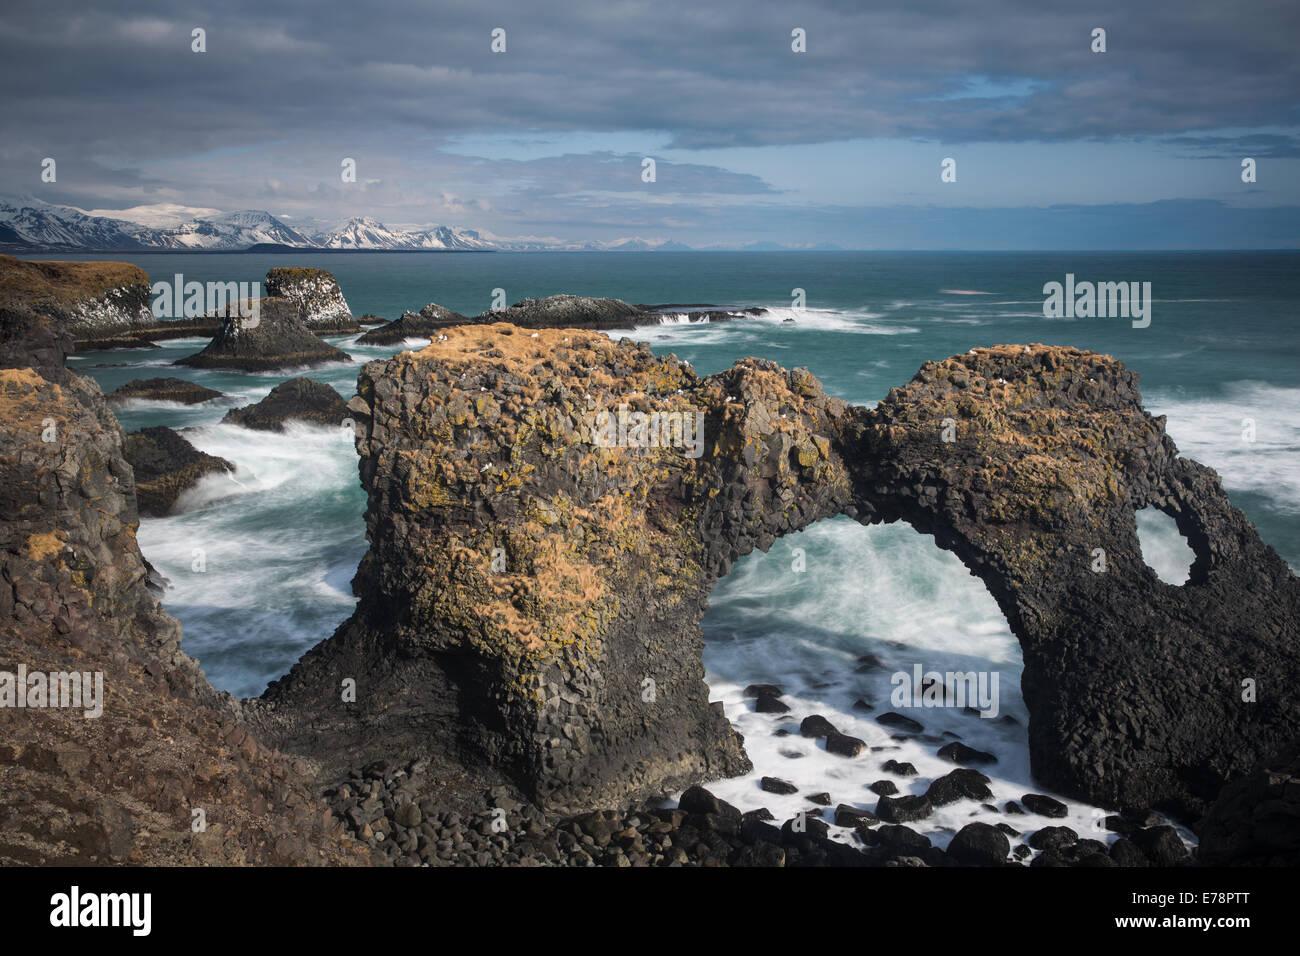 La roccia arco di Gatklettur sulla costa nr Arnastapi, Snaefellsnes Peninsula, western Islanda Immagini Stock